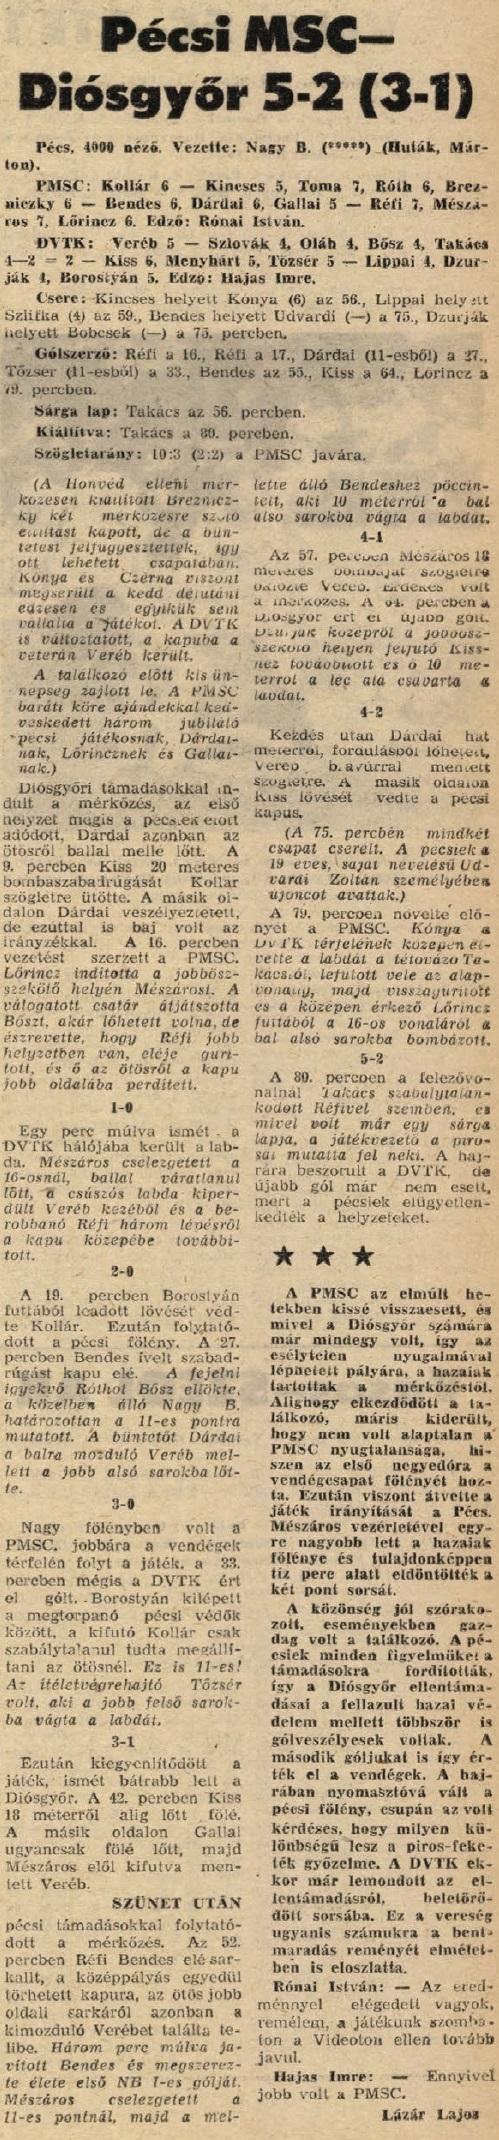 idokapszula_nb_i_1983_84_27_fordulo_pecsi_msc_dvtk.jpg